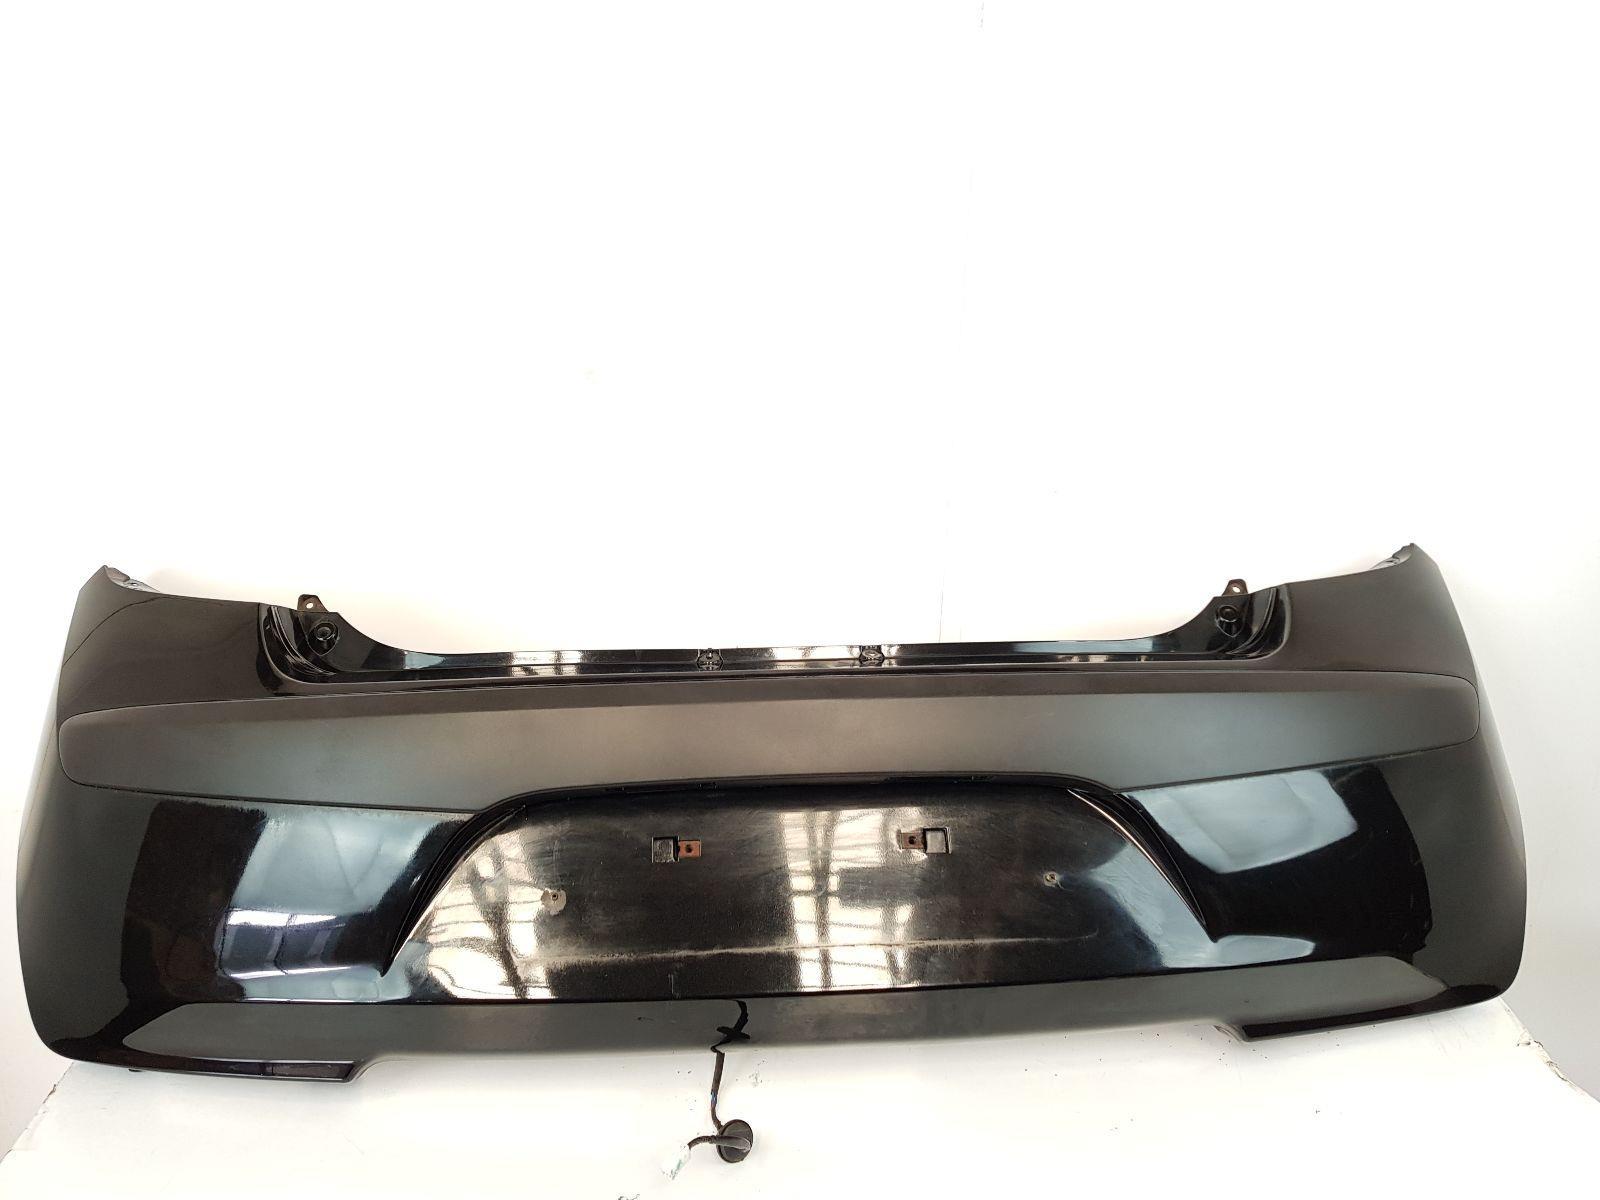 2008-2010 MK1 Hyundai i10 REAR BUMPER Black 5 Door Hatchback 866120X000